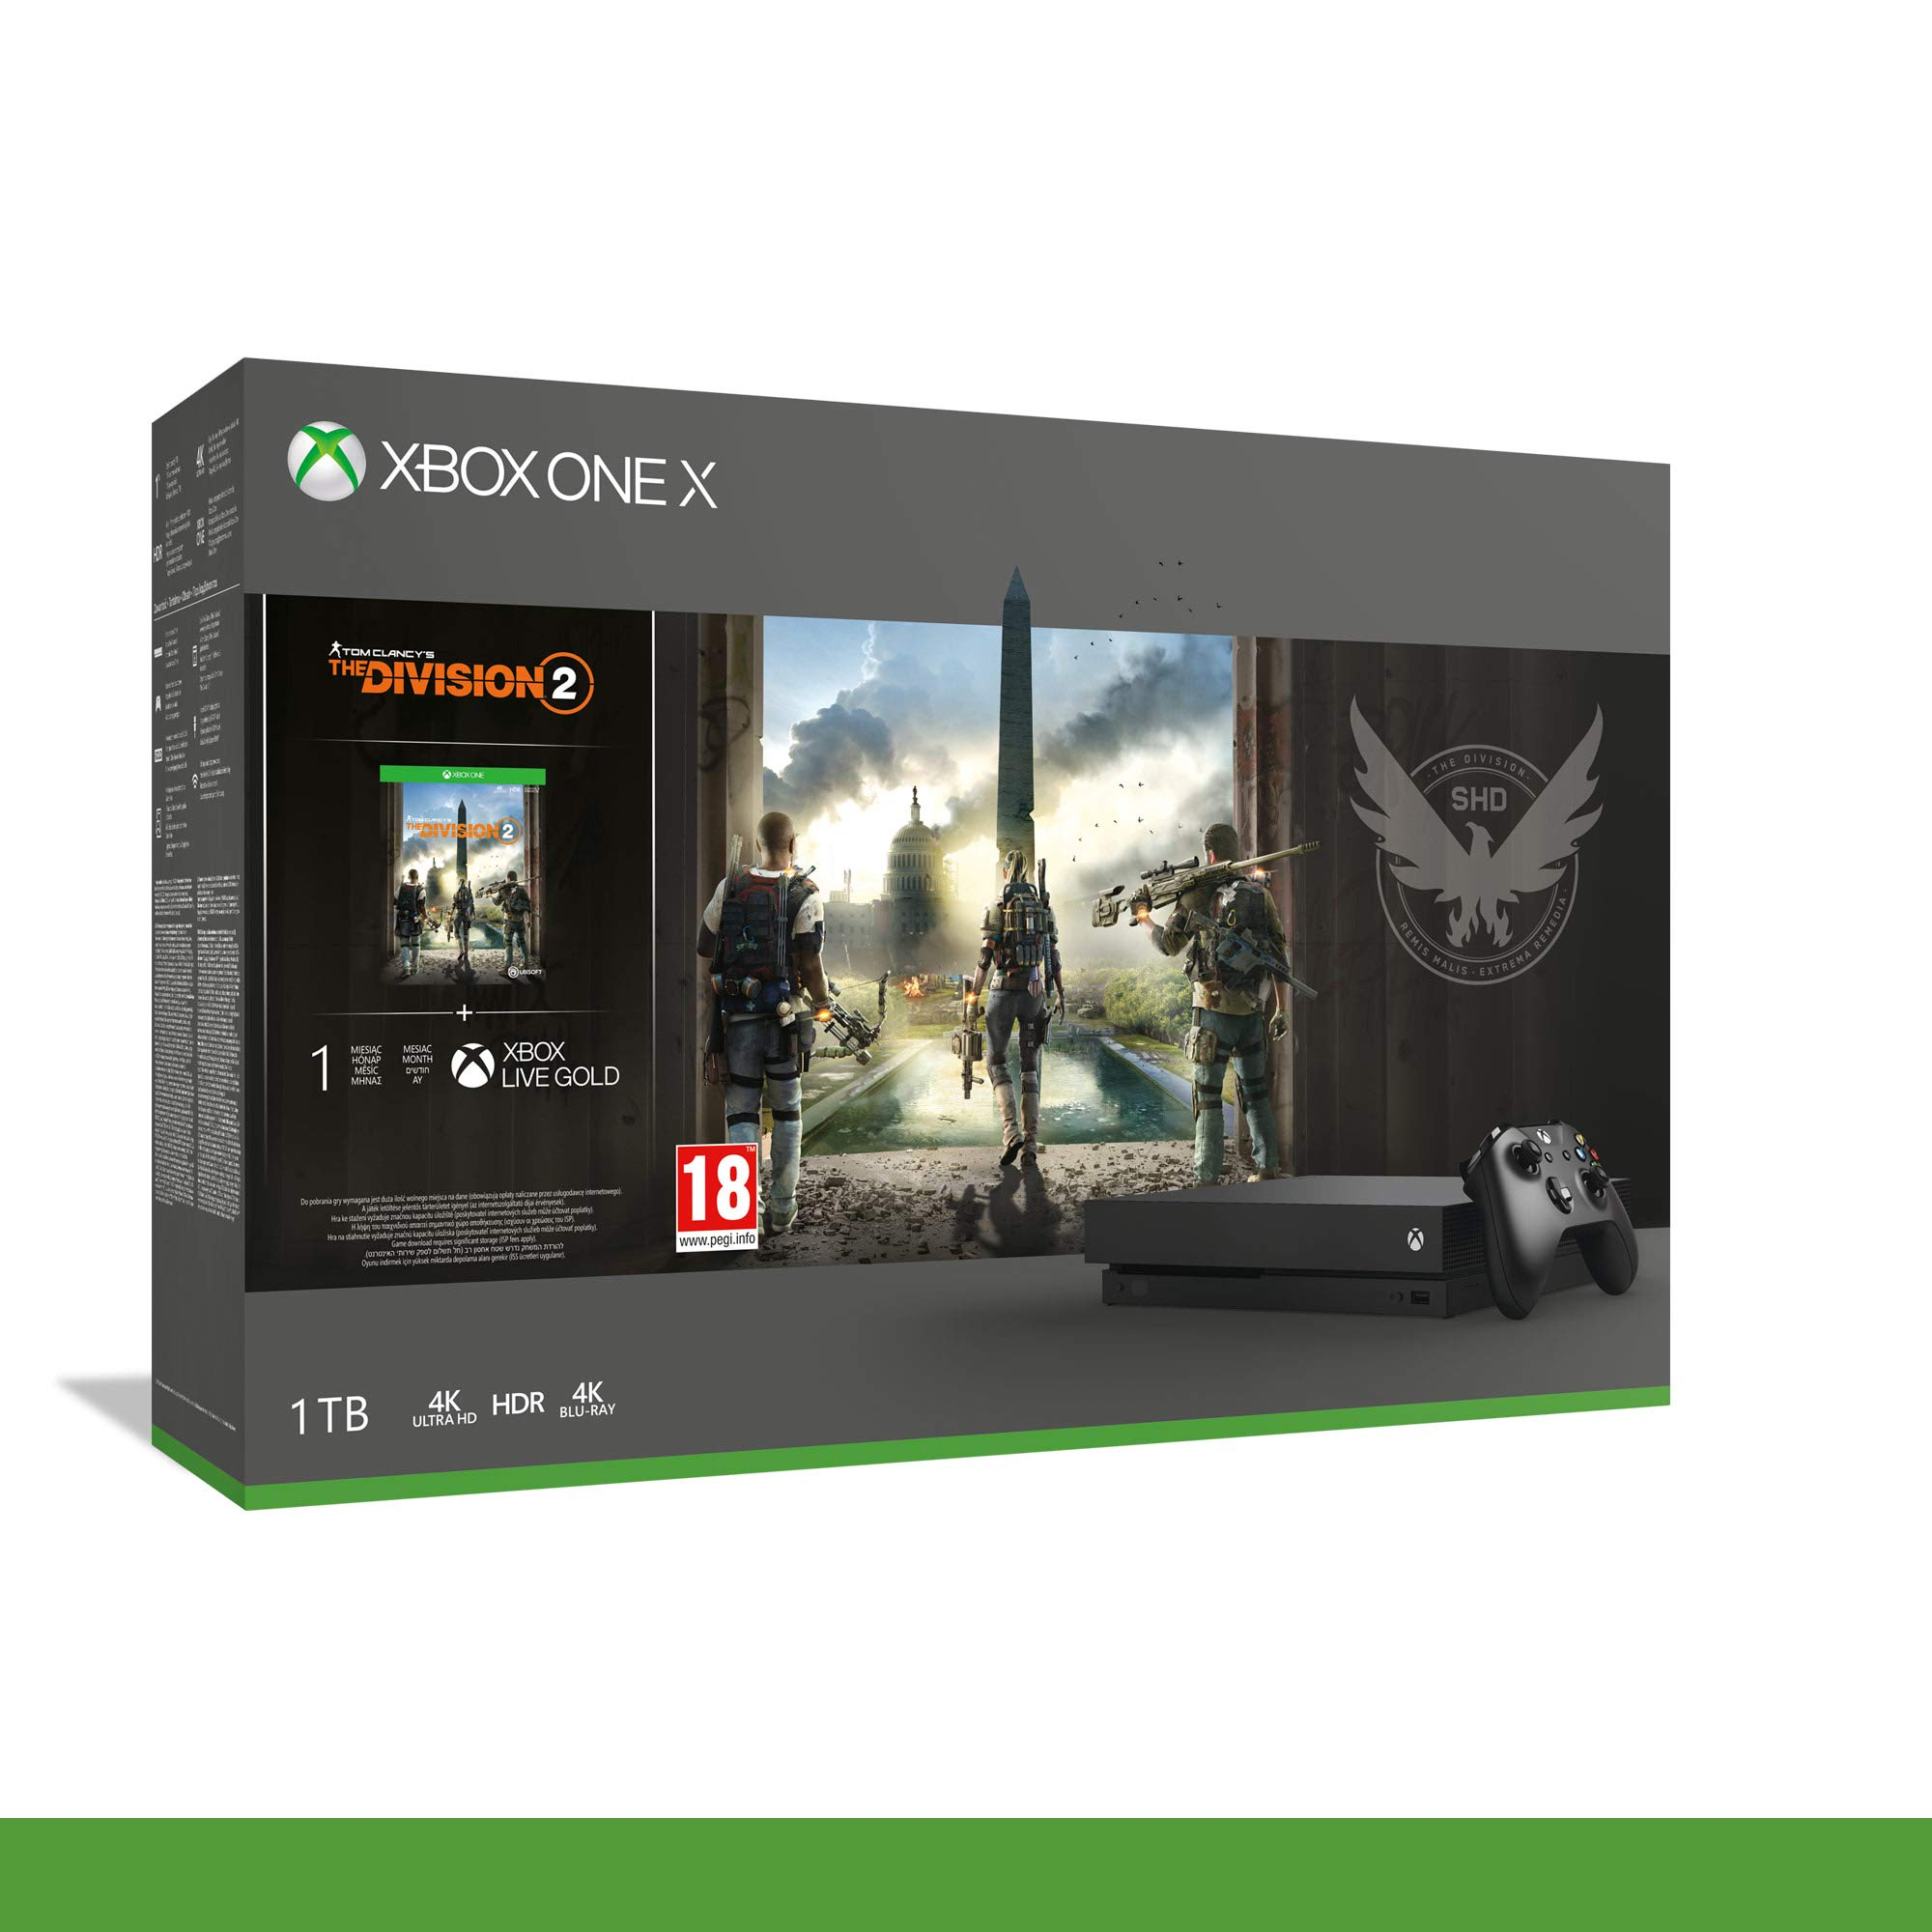 Microsoft Xbox One X + Tom Clancys The Division 2 Negro 1000 GB Wifi - Videoconsolas (Xbox One X, Negro, 8192 MB, GDDR5, GDDR5, 12288 MB): Amazon.es: Videojuegos